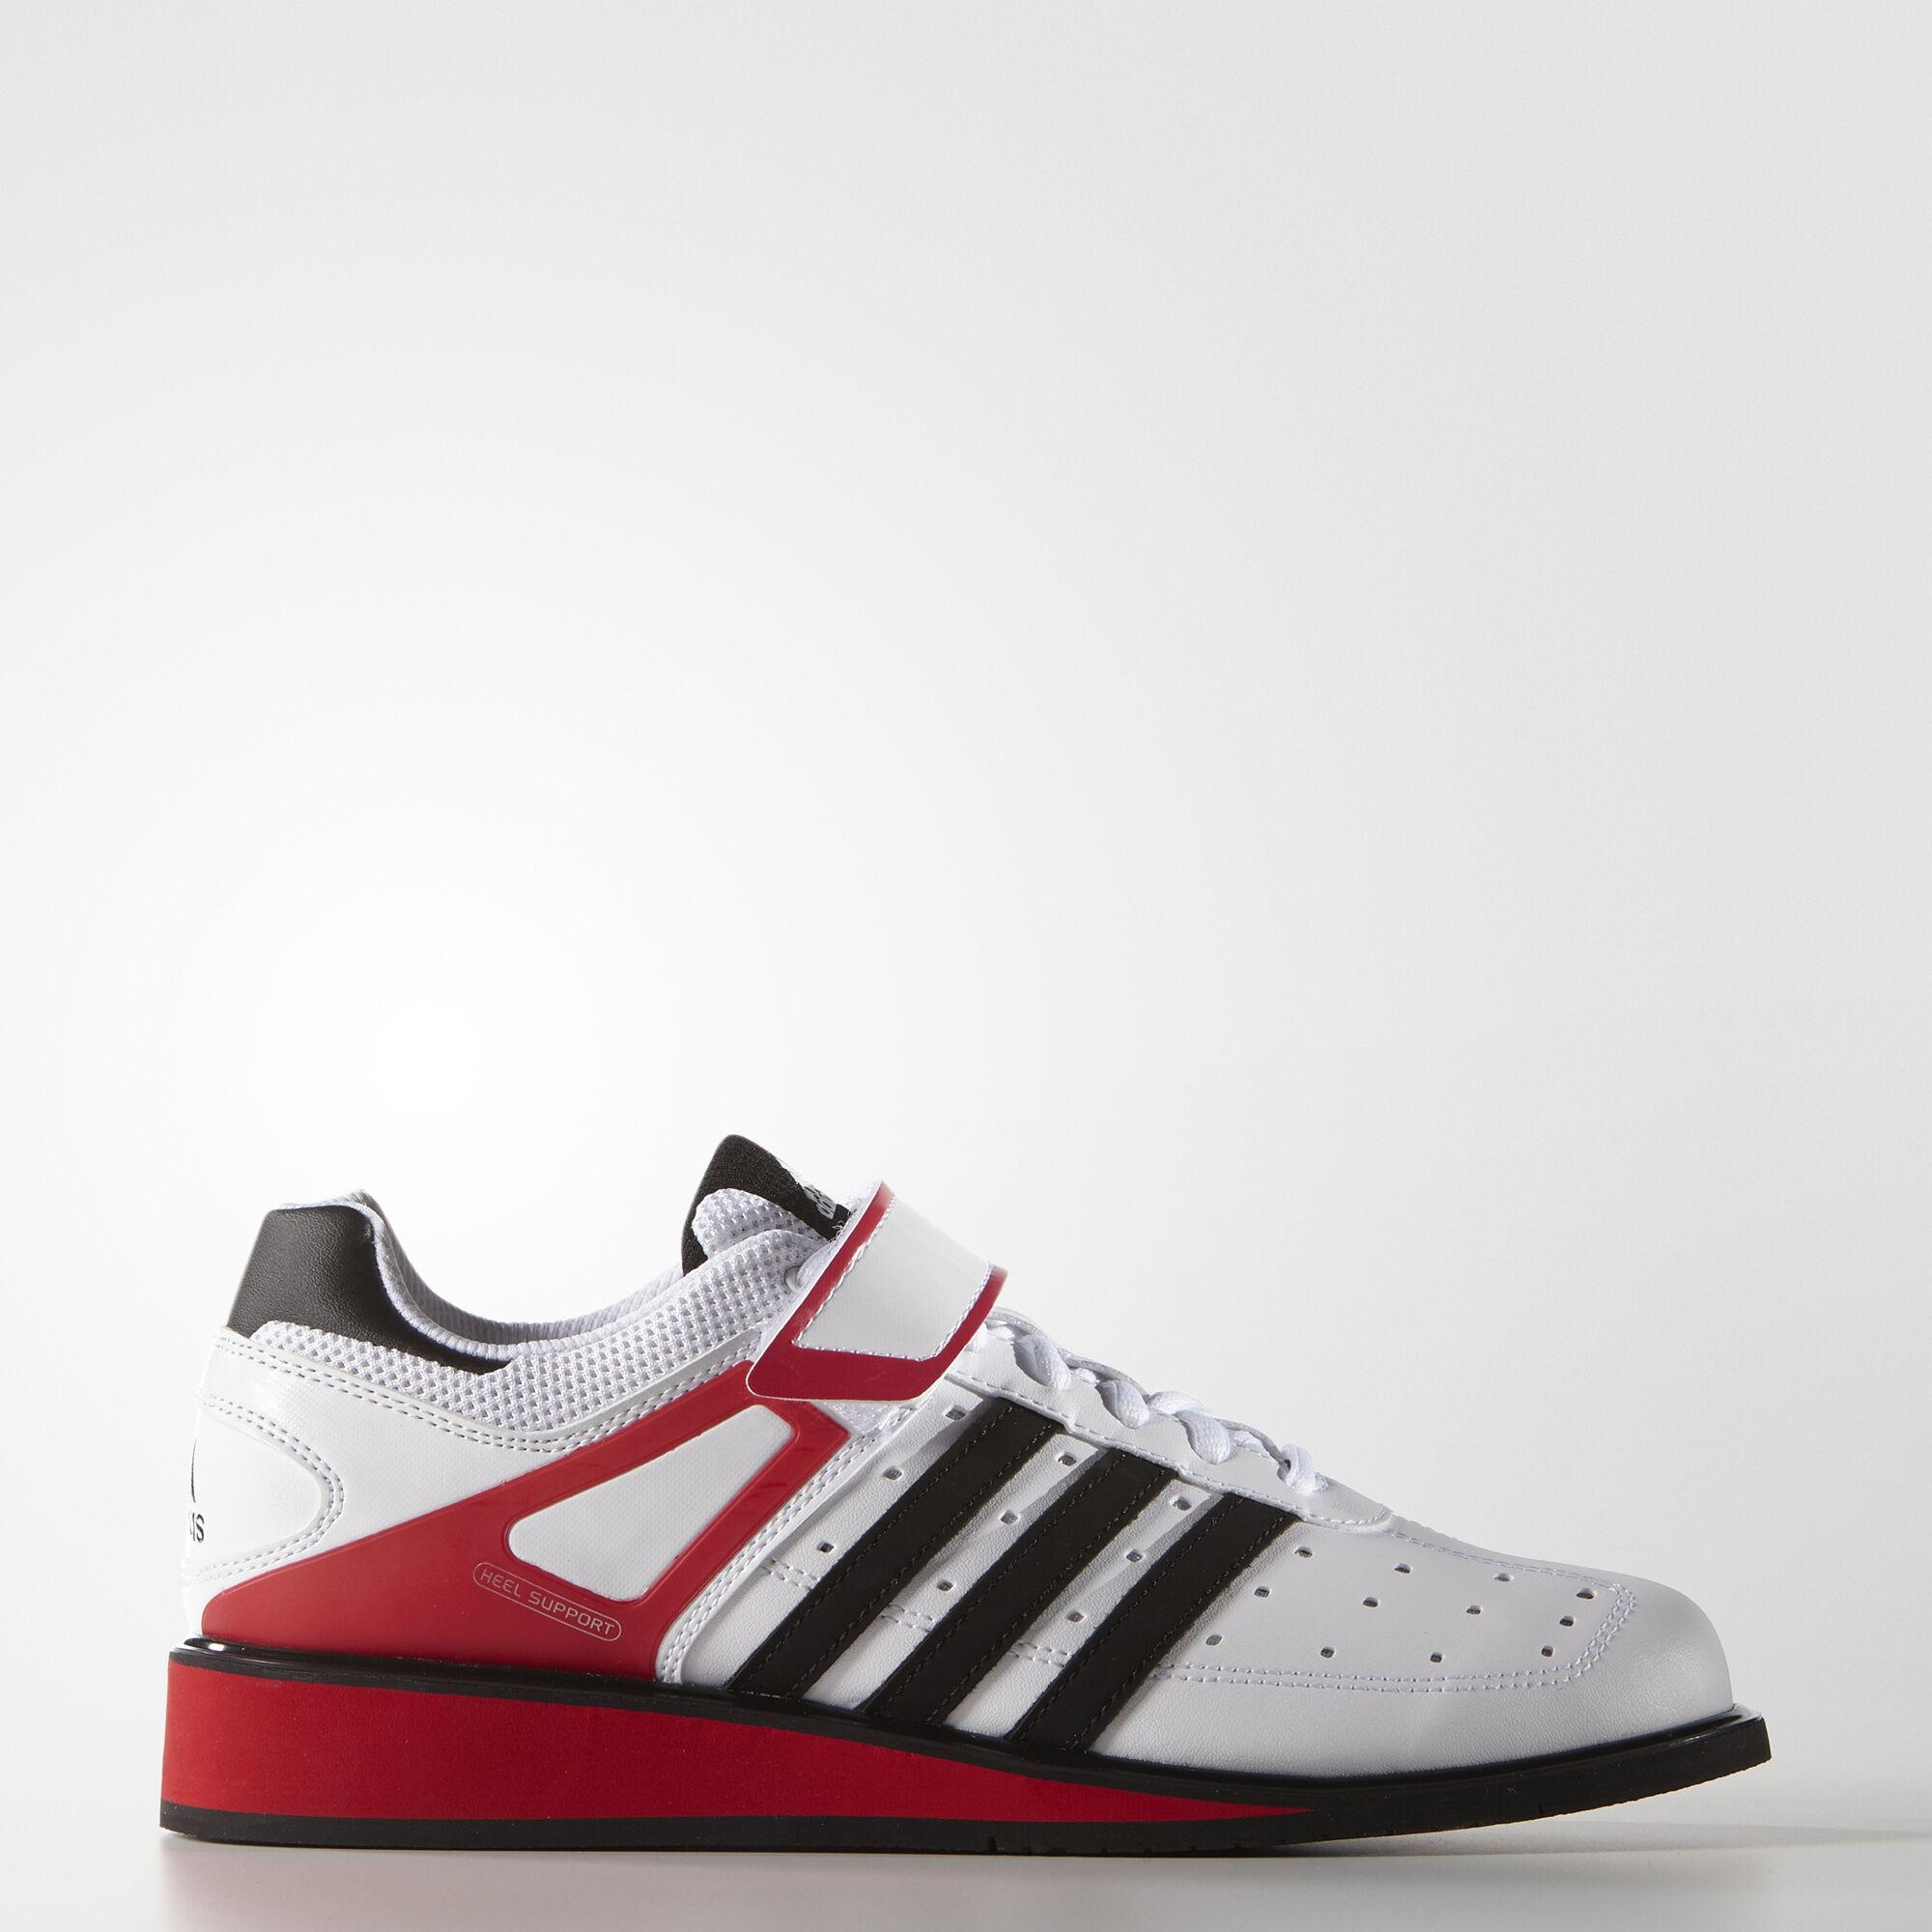 adidas power che financial services ltd